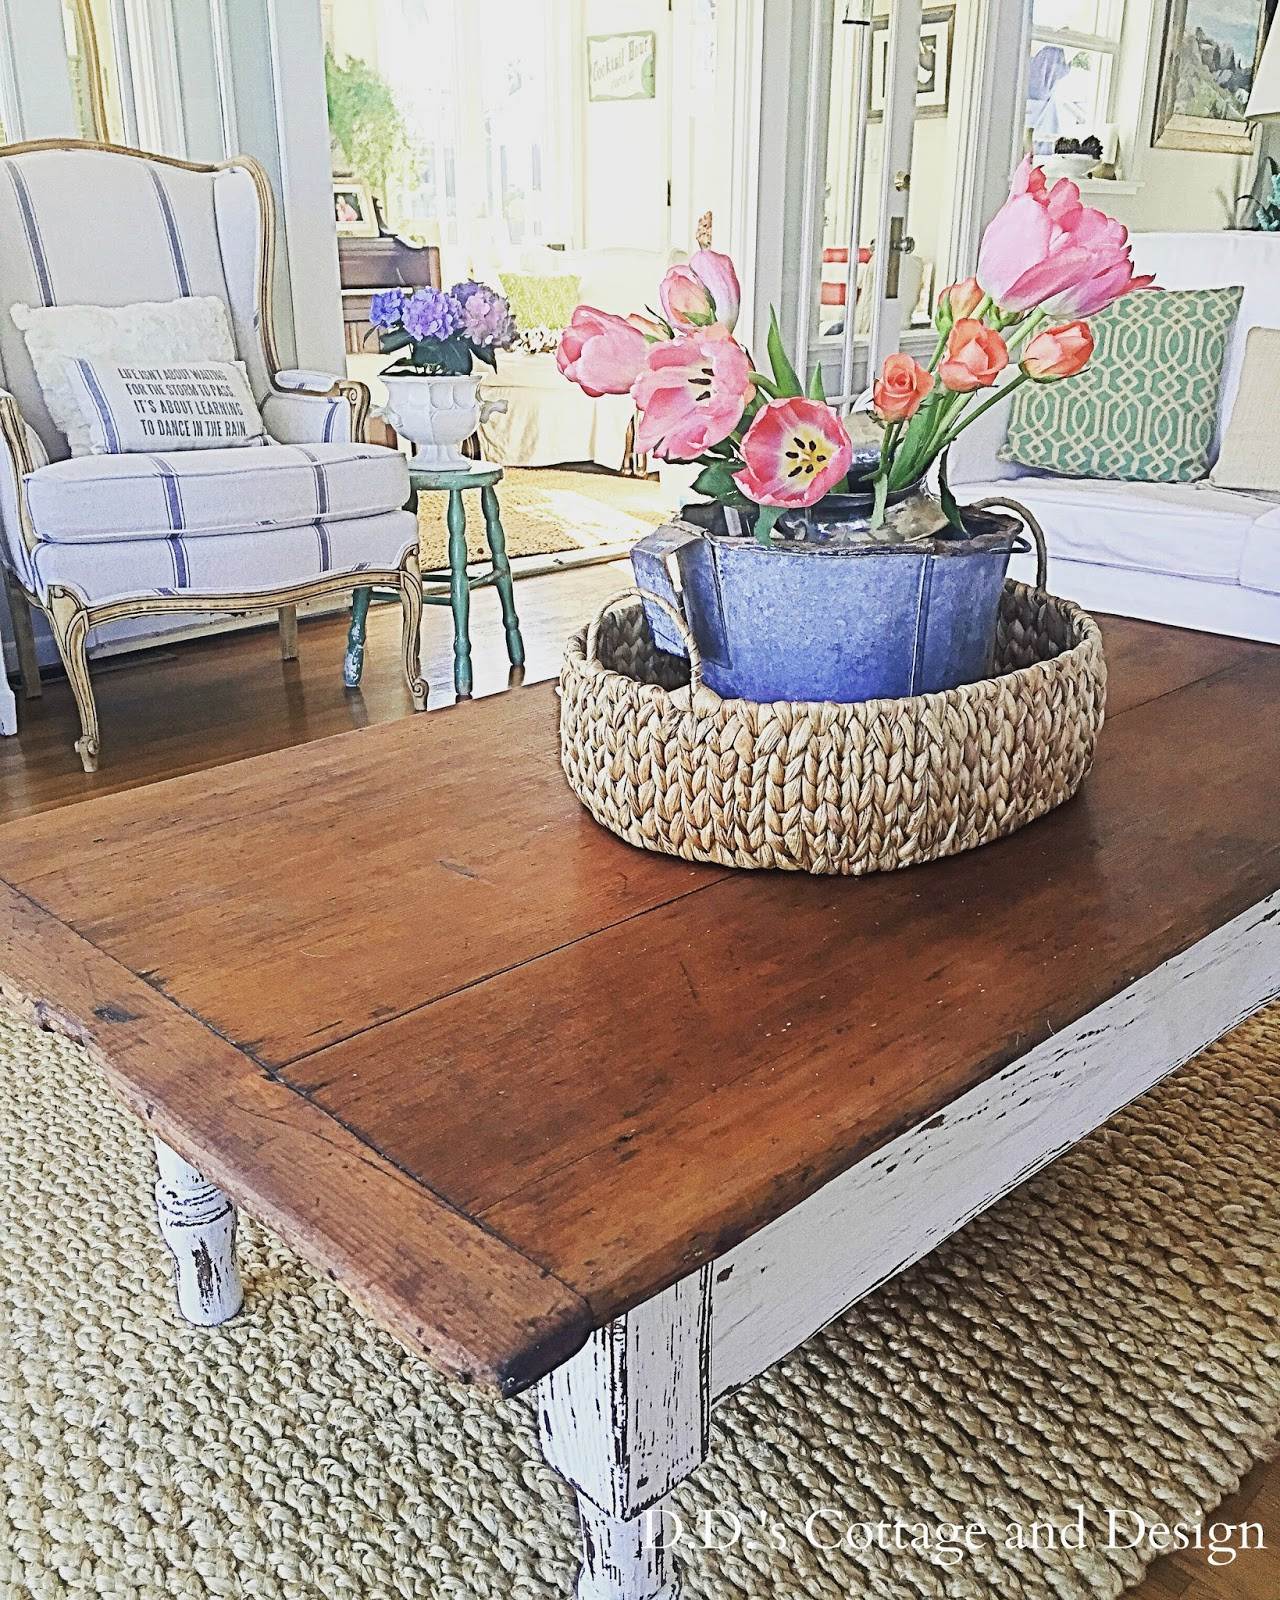 D D s Cottage and Design My Vintage Farm Table